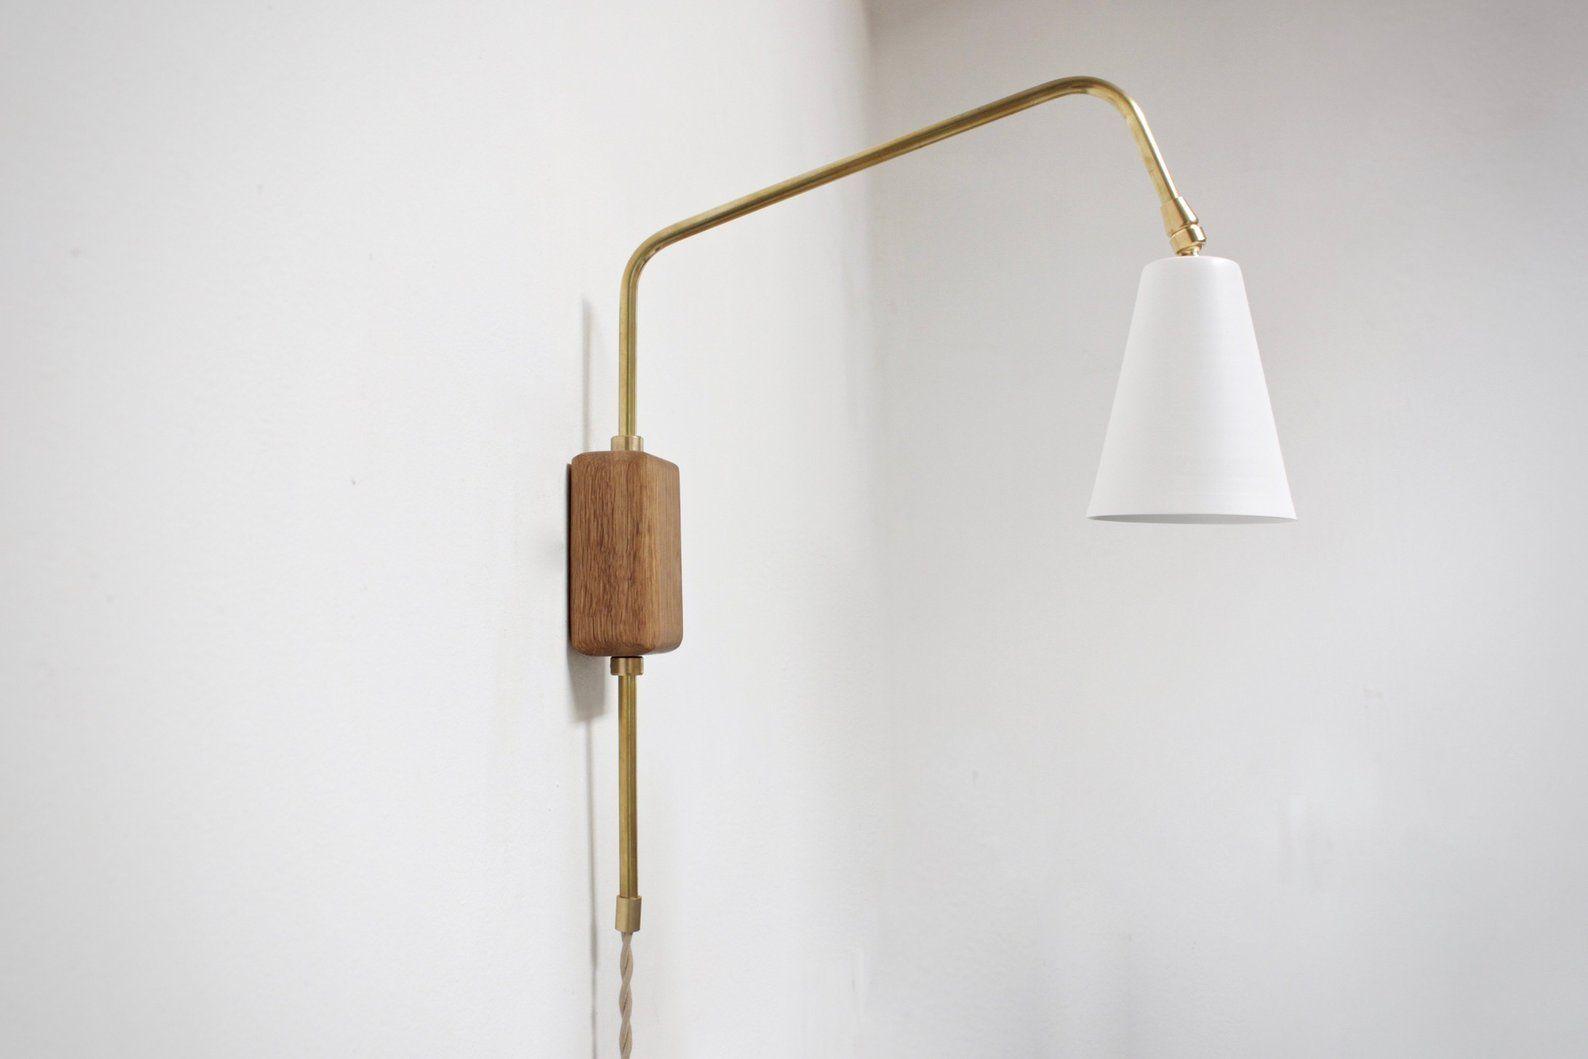 Swing Arm Sconce White Lamp Wall Lamp Adjustable Light Mid Etsy Adjustable Lighting White Lamp Wall Lamp